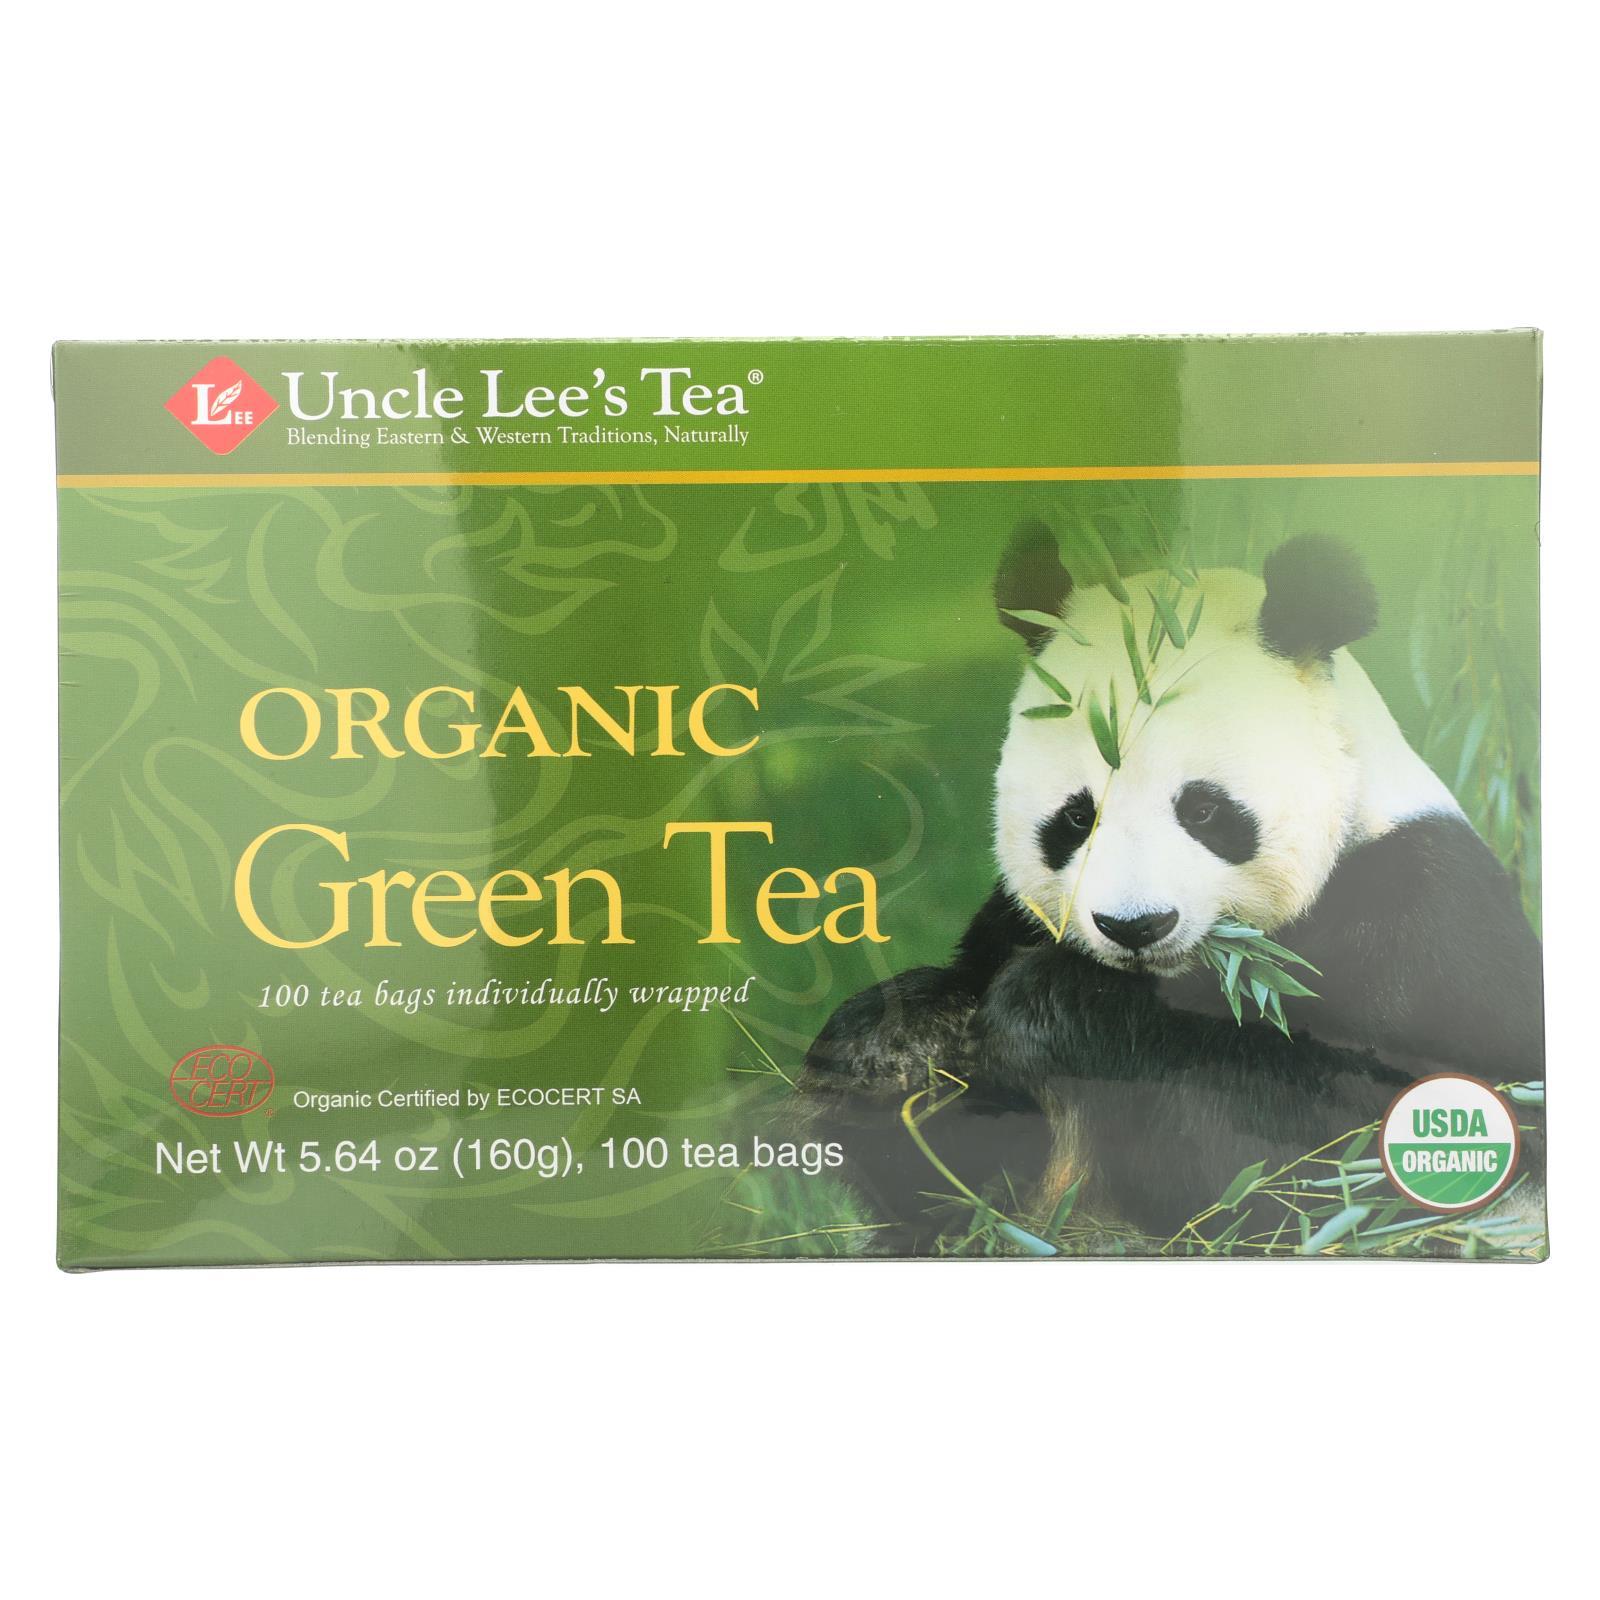 Uncle Lee's Legends of China Organic Green Tea - 100 Tea Bags